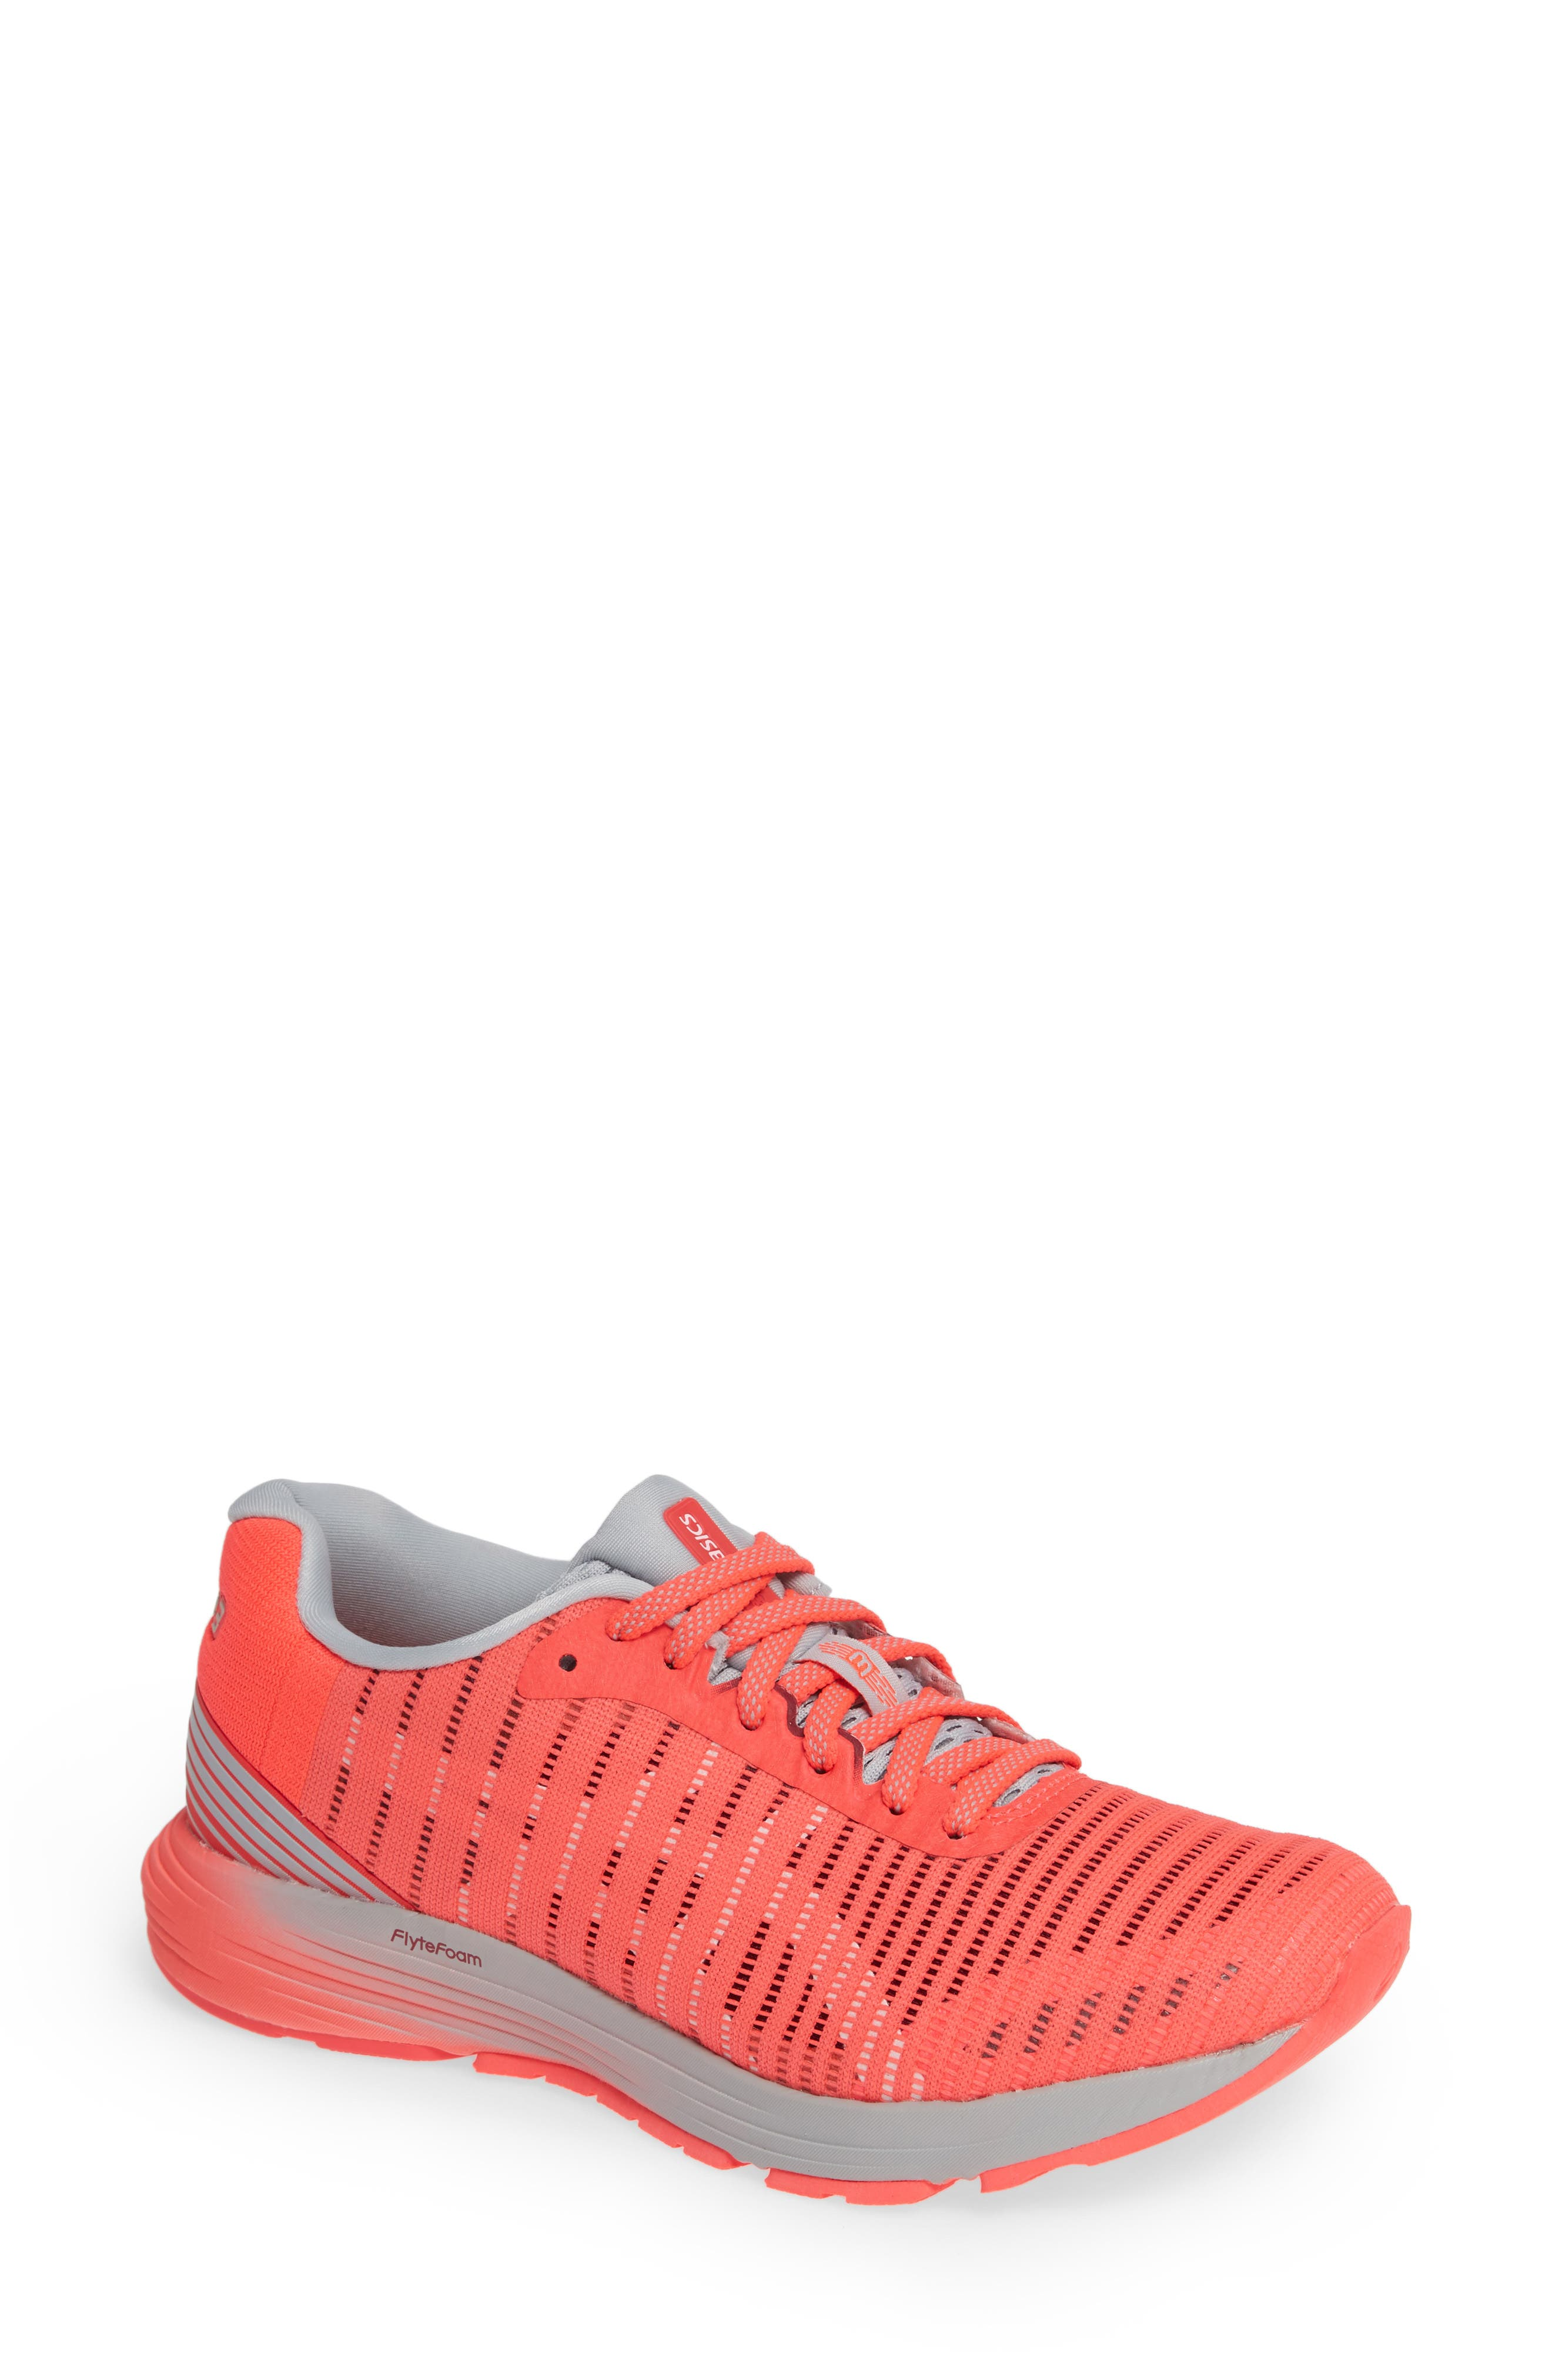 Asics Shoes Shoes Nordstrom Asics dq7Rwdg0